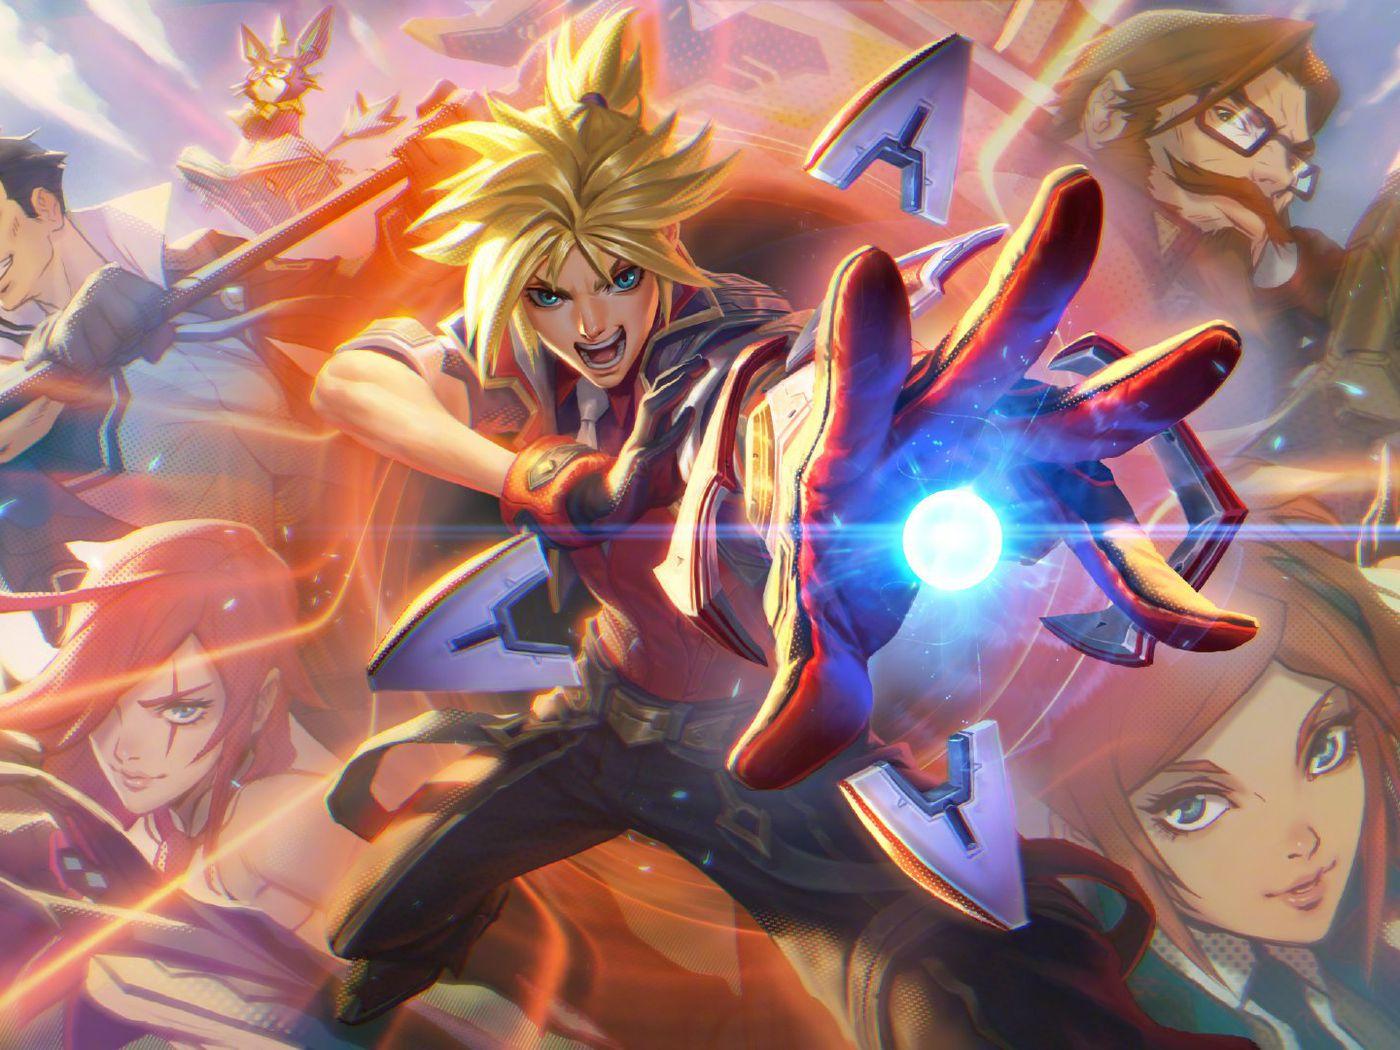 League Battle Academia skins: Ezreal, Katarina, Yuumi, Lux, and more